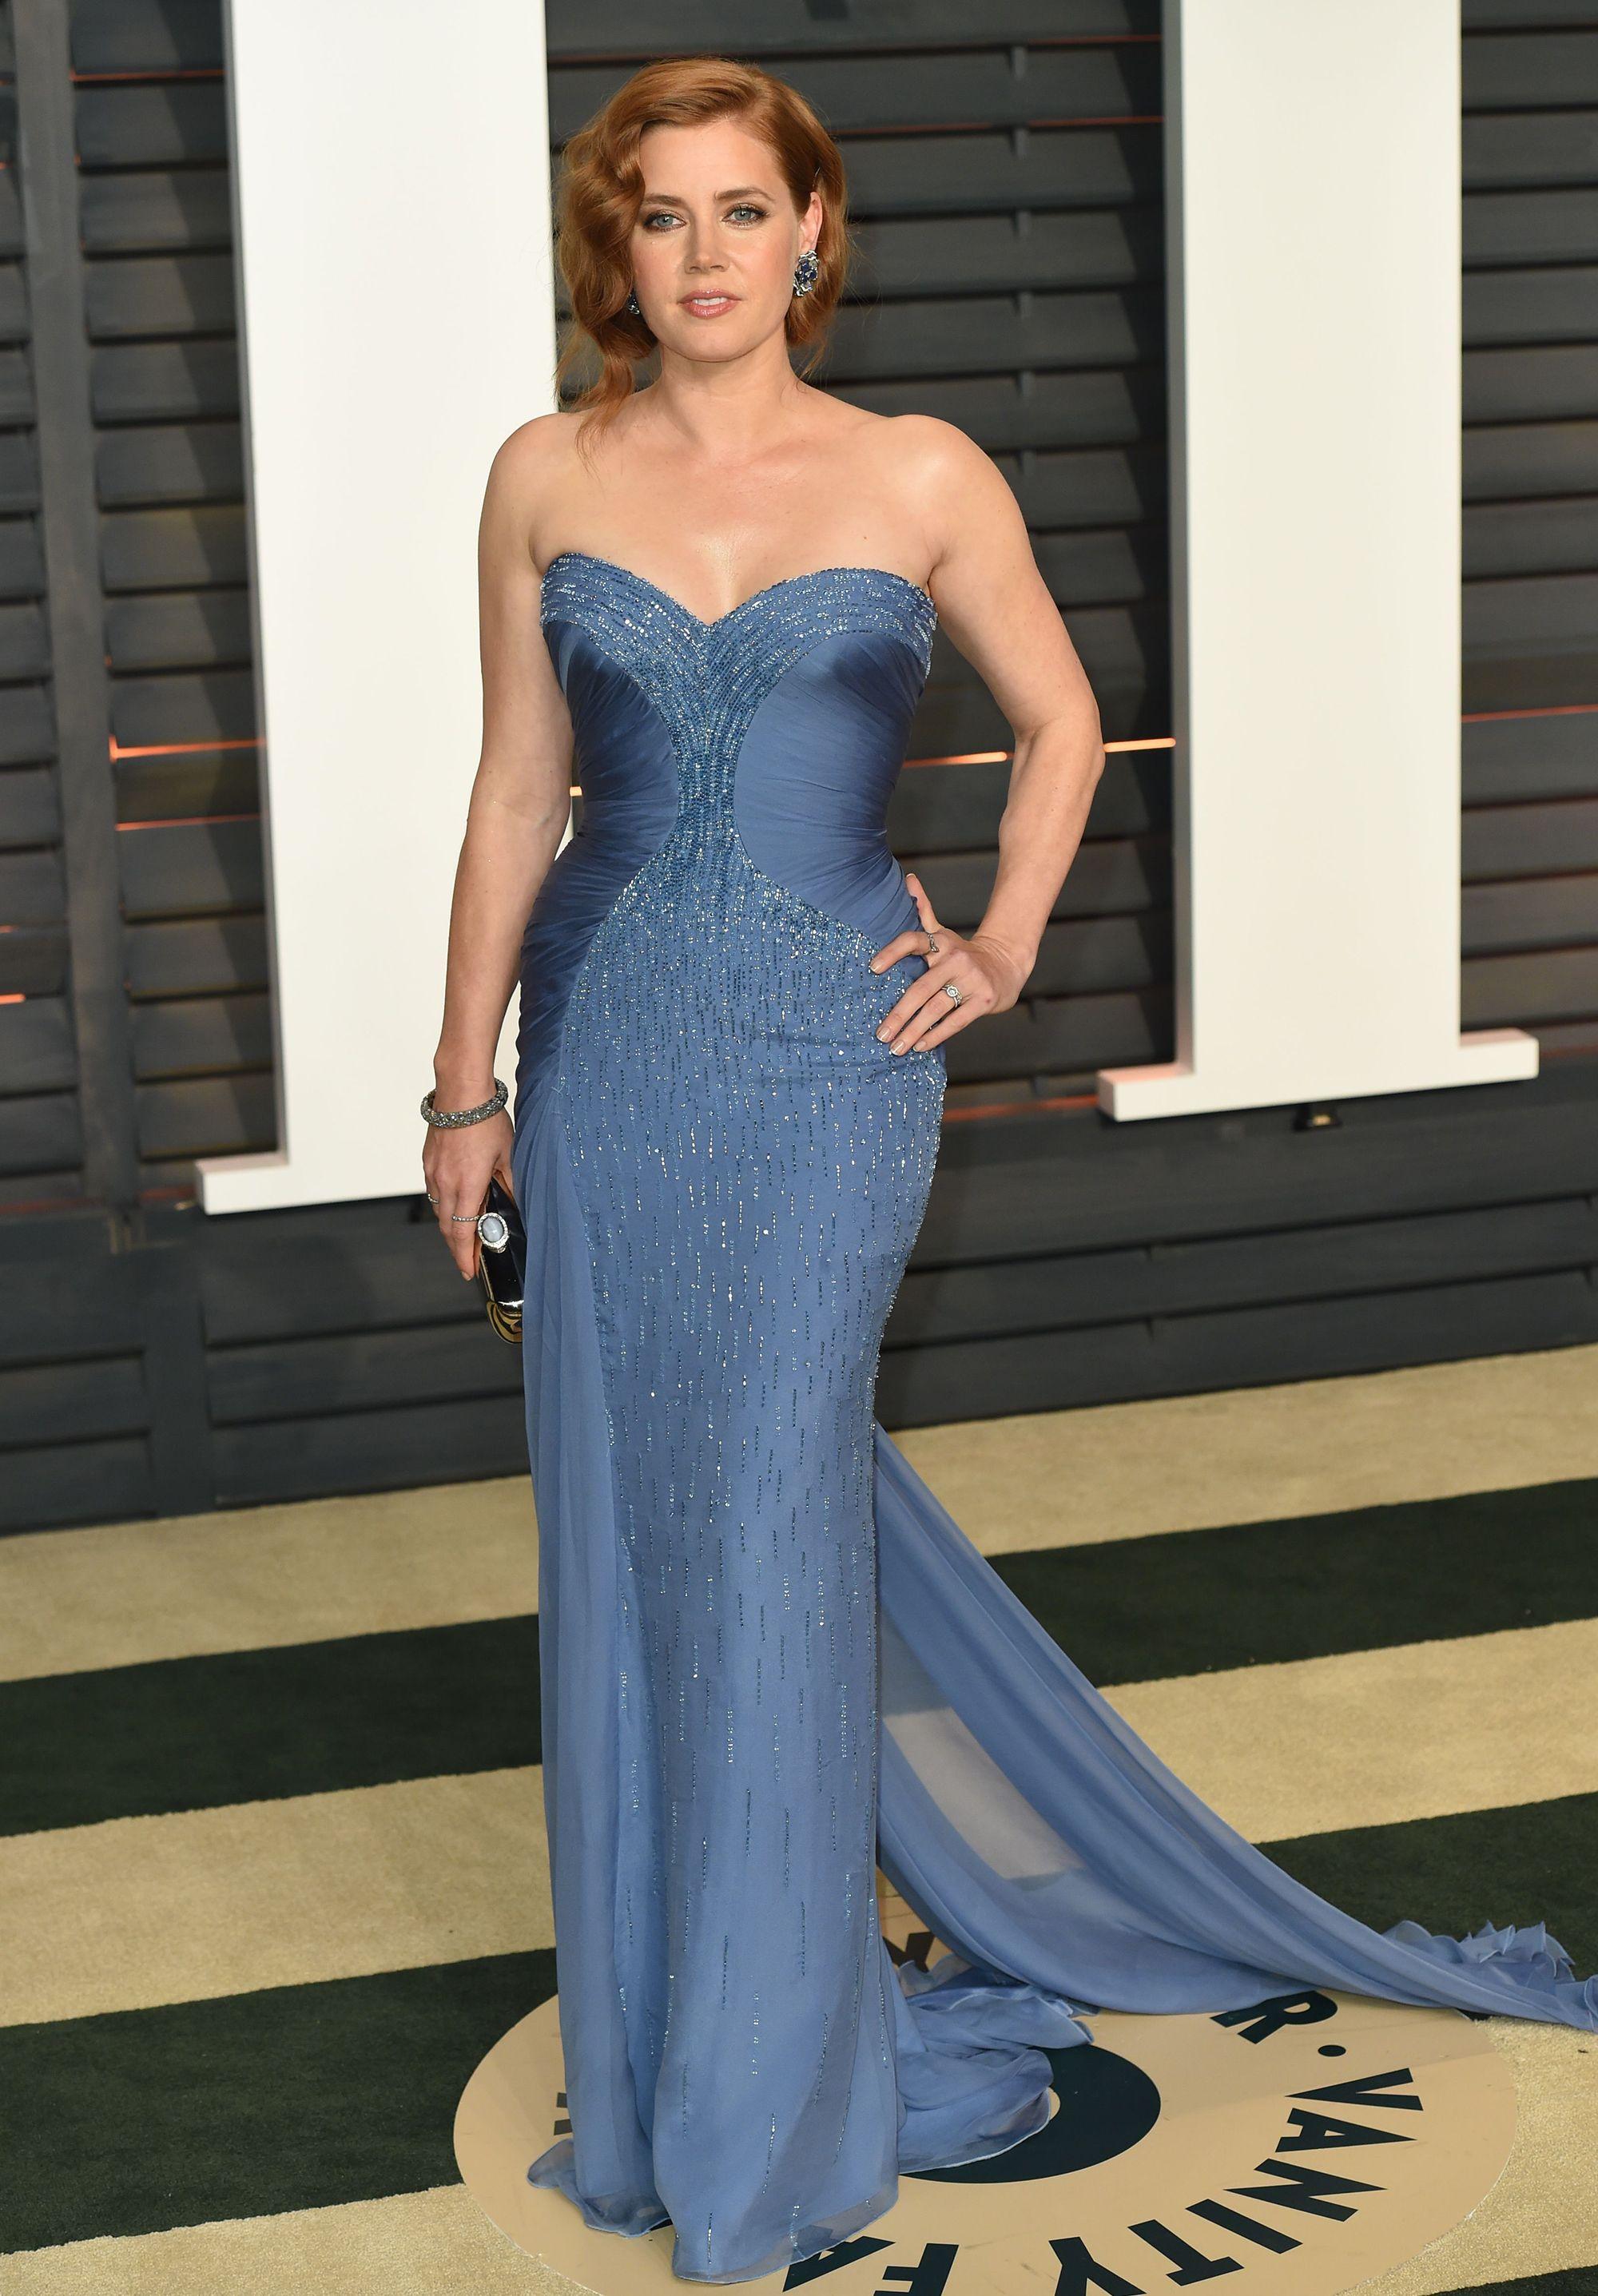 2015 Vanity Fair Oscars Party: all the best dresses